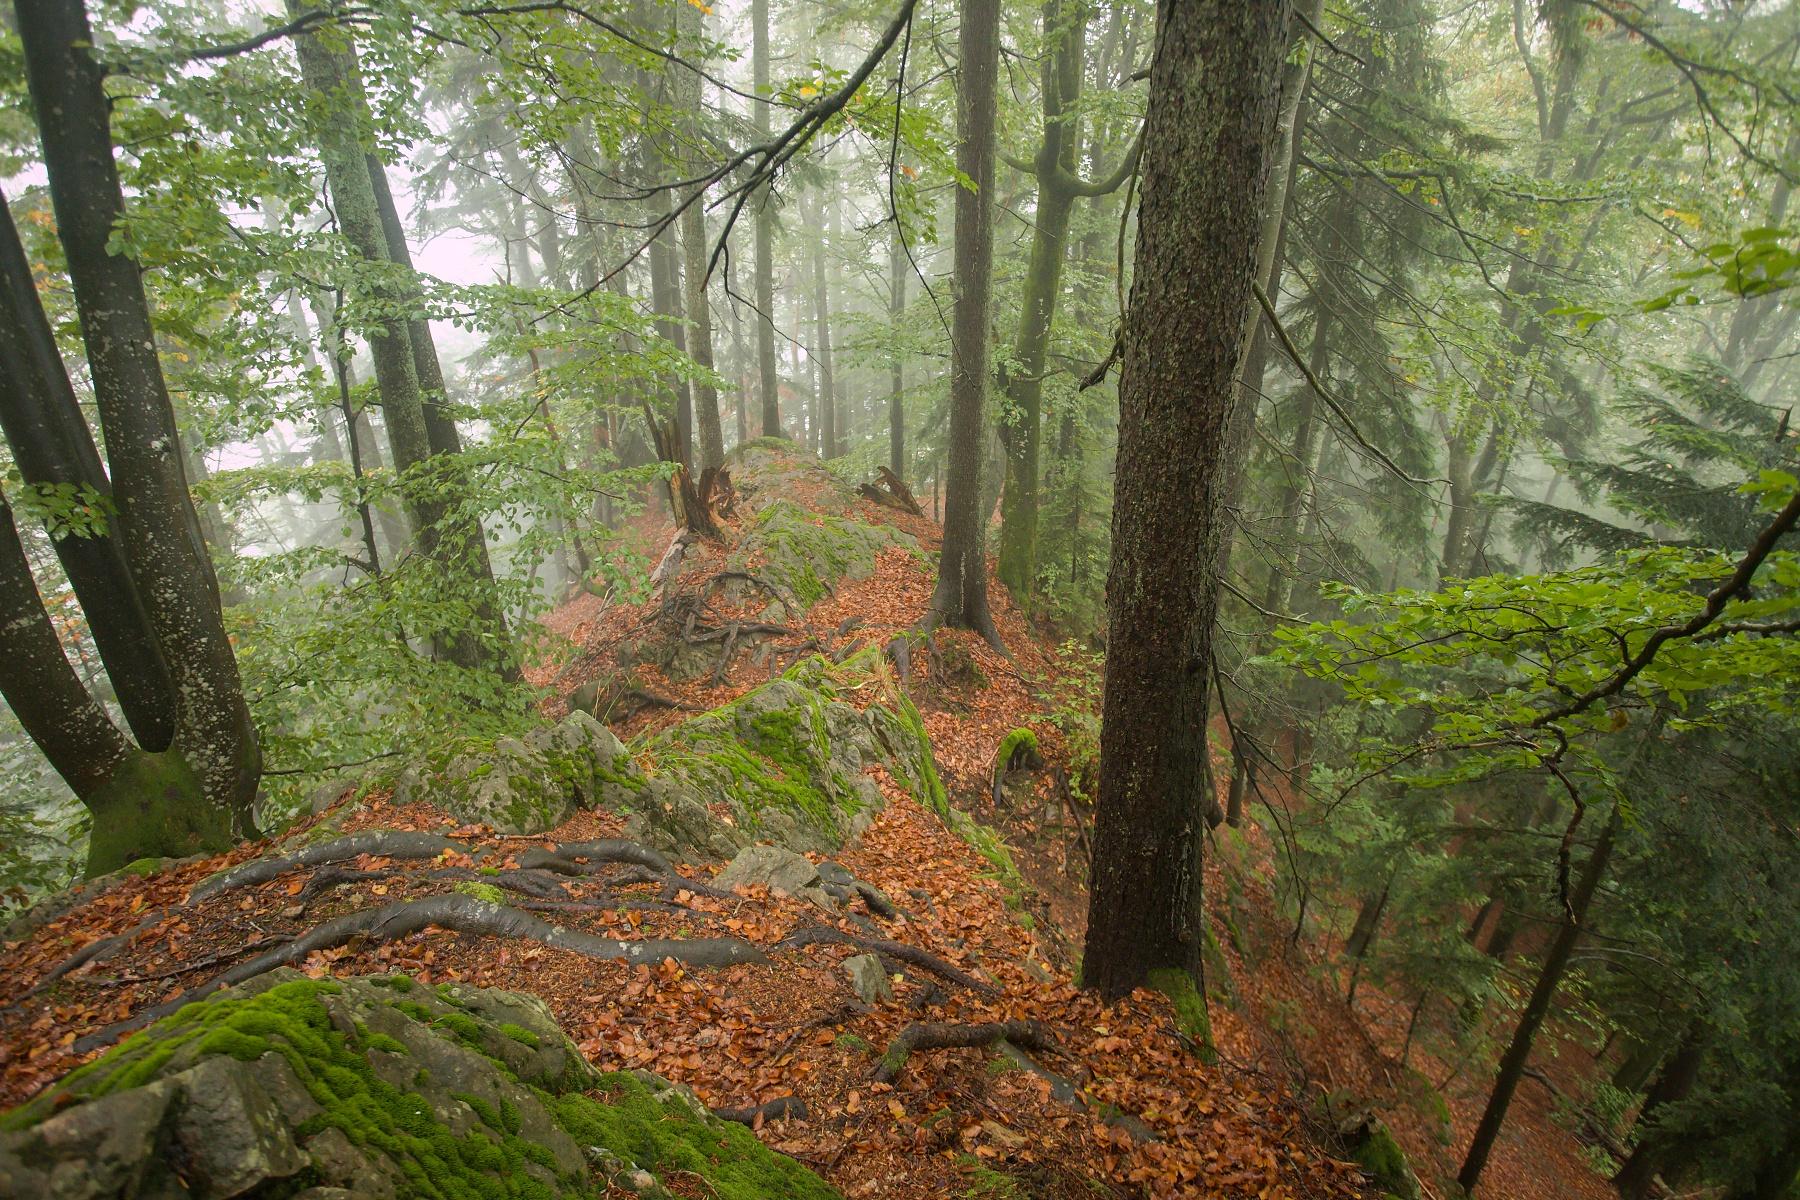 Criva valley, Munții Maramureșului, Romania Canon EOS 6d mark II + Canon 17-40mm, 22mm, 1/40, f4.5, ISO 2500, 1. október 2020